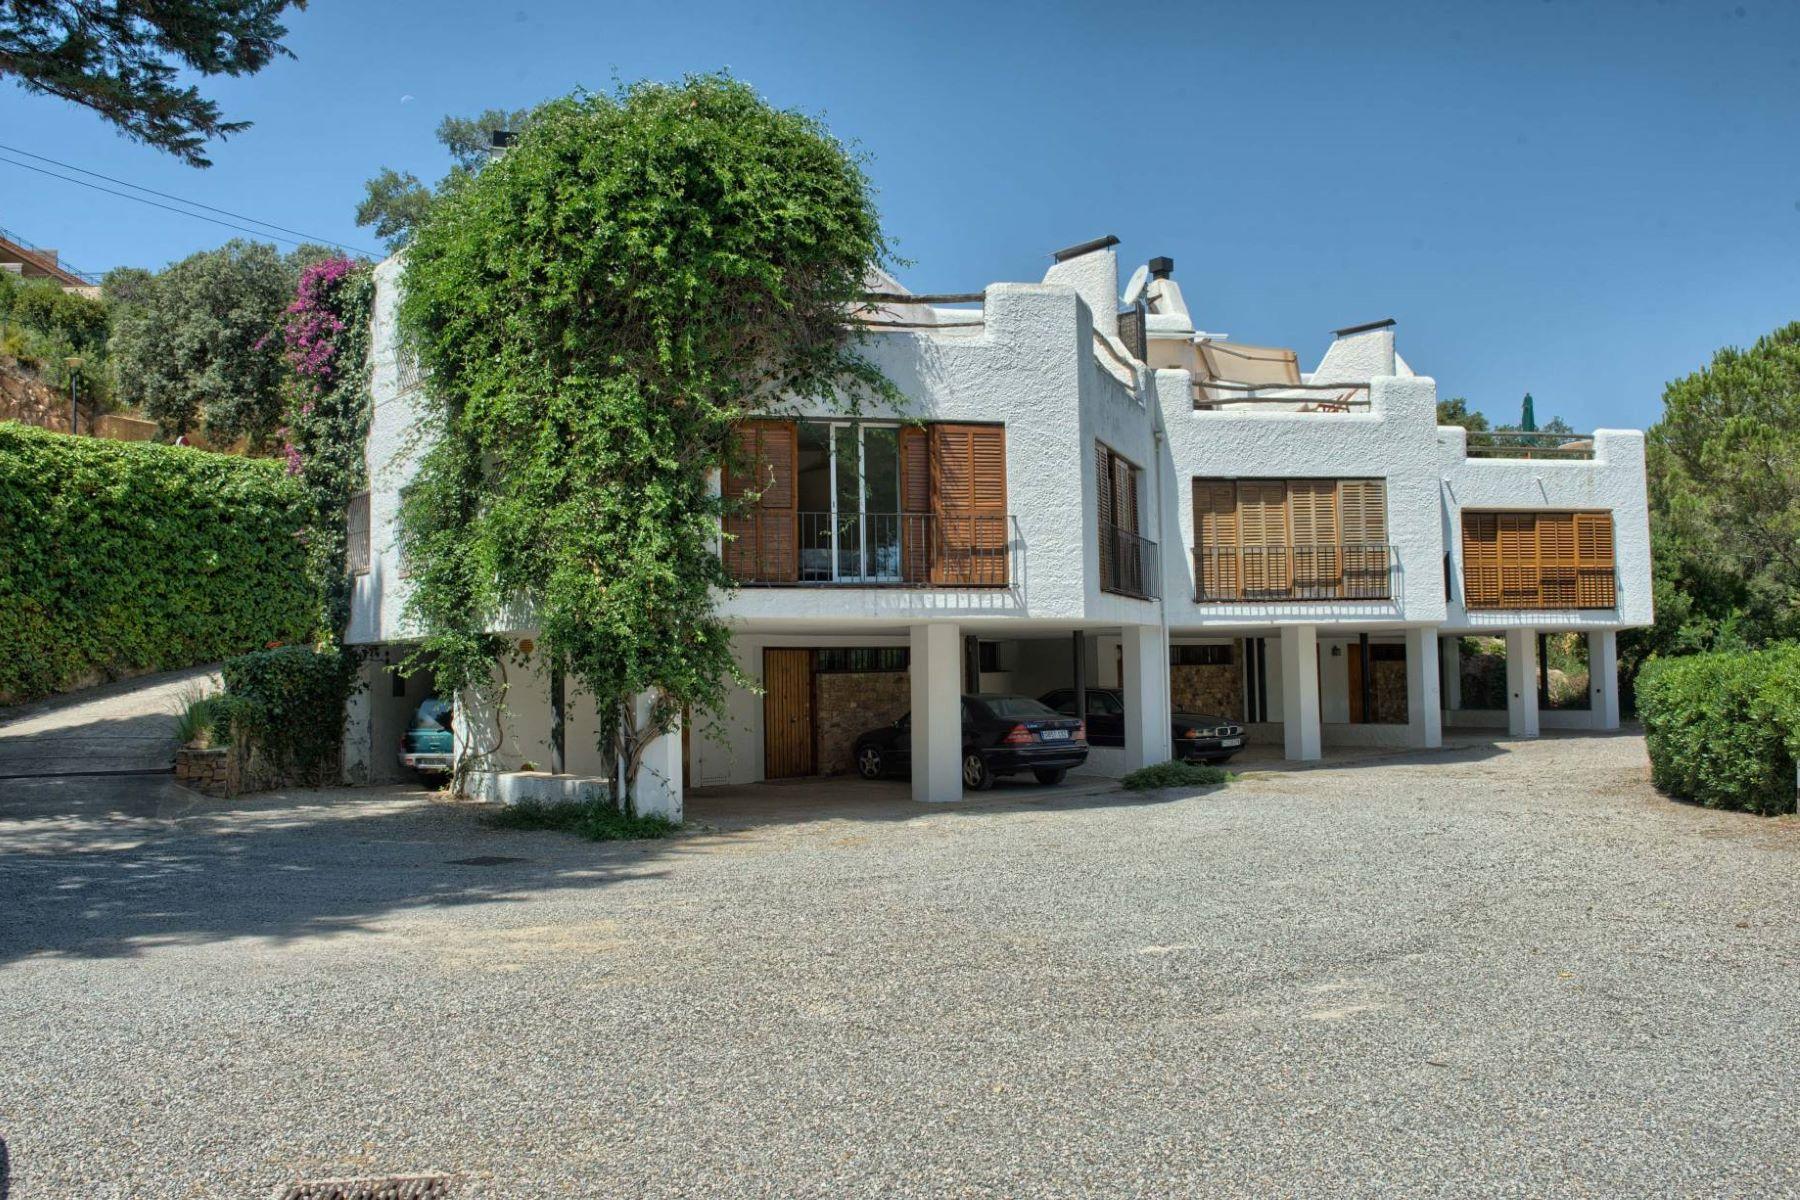 Maison unifamiliale pour l Vente à Corner terraced house 100 steps from the sea in Aiguablava Begur, Costa Brava, 17255 Espagne